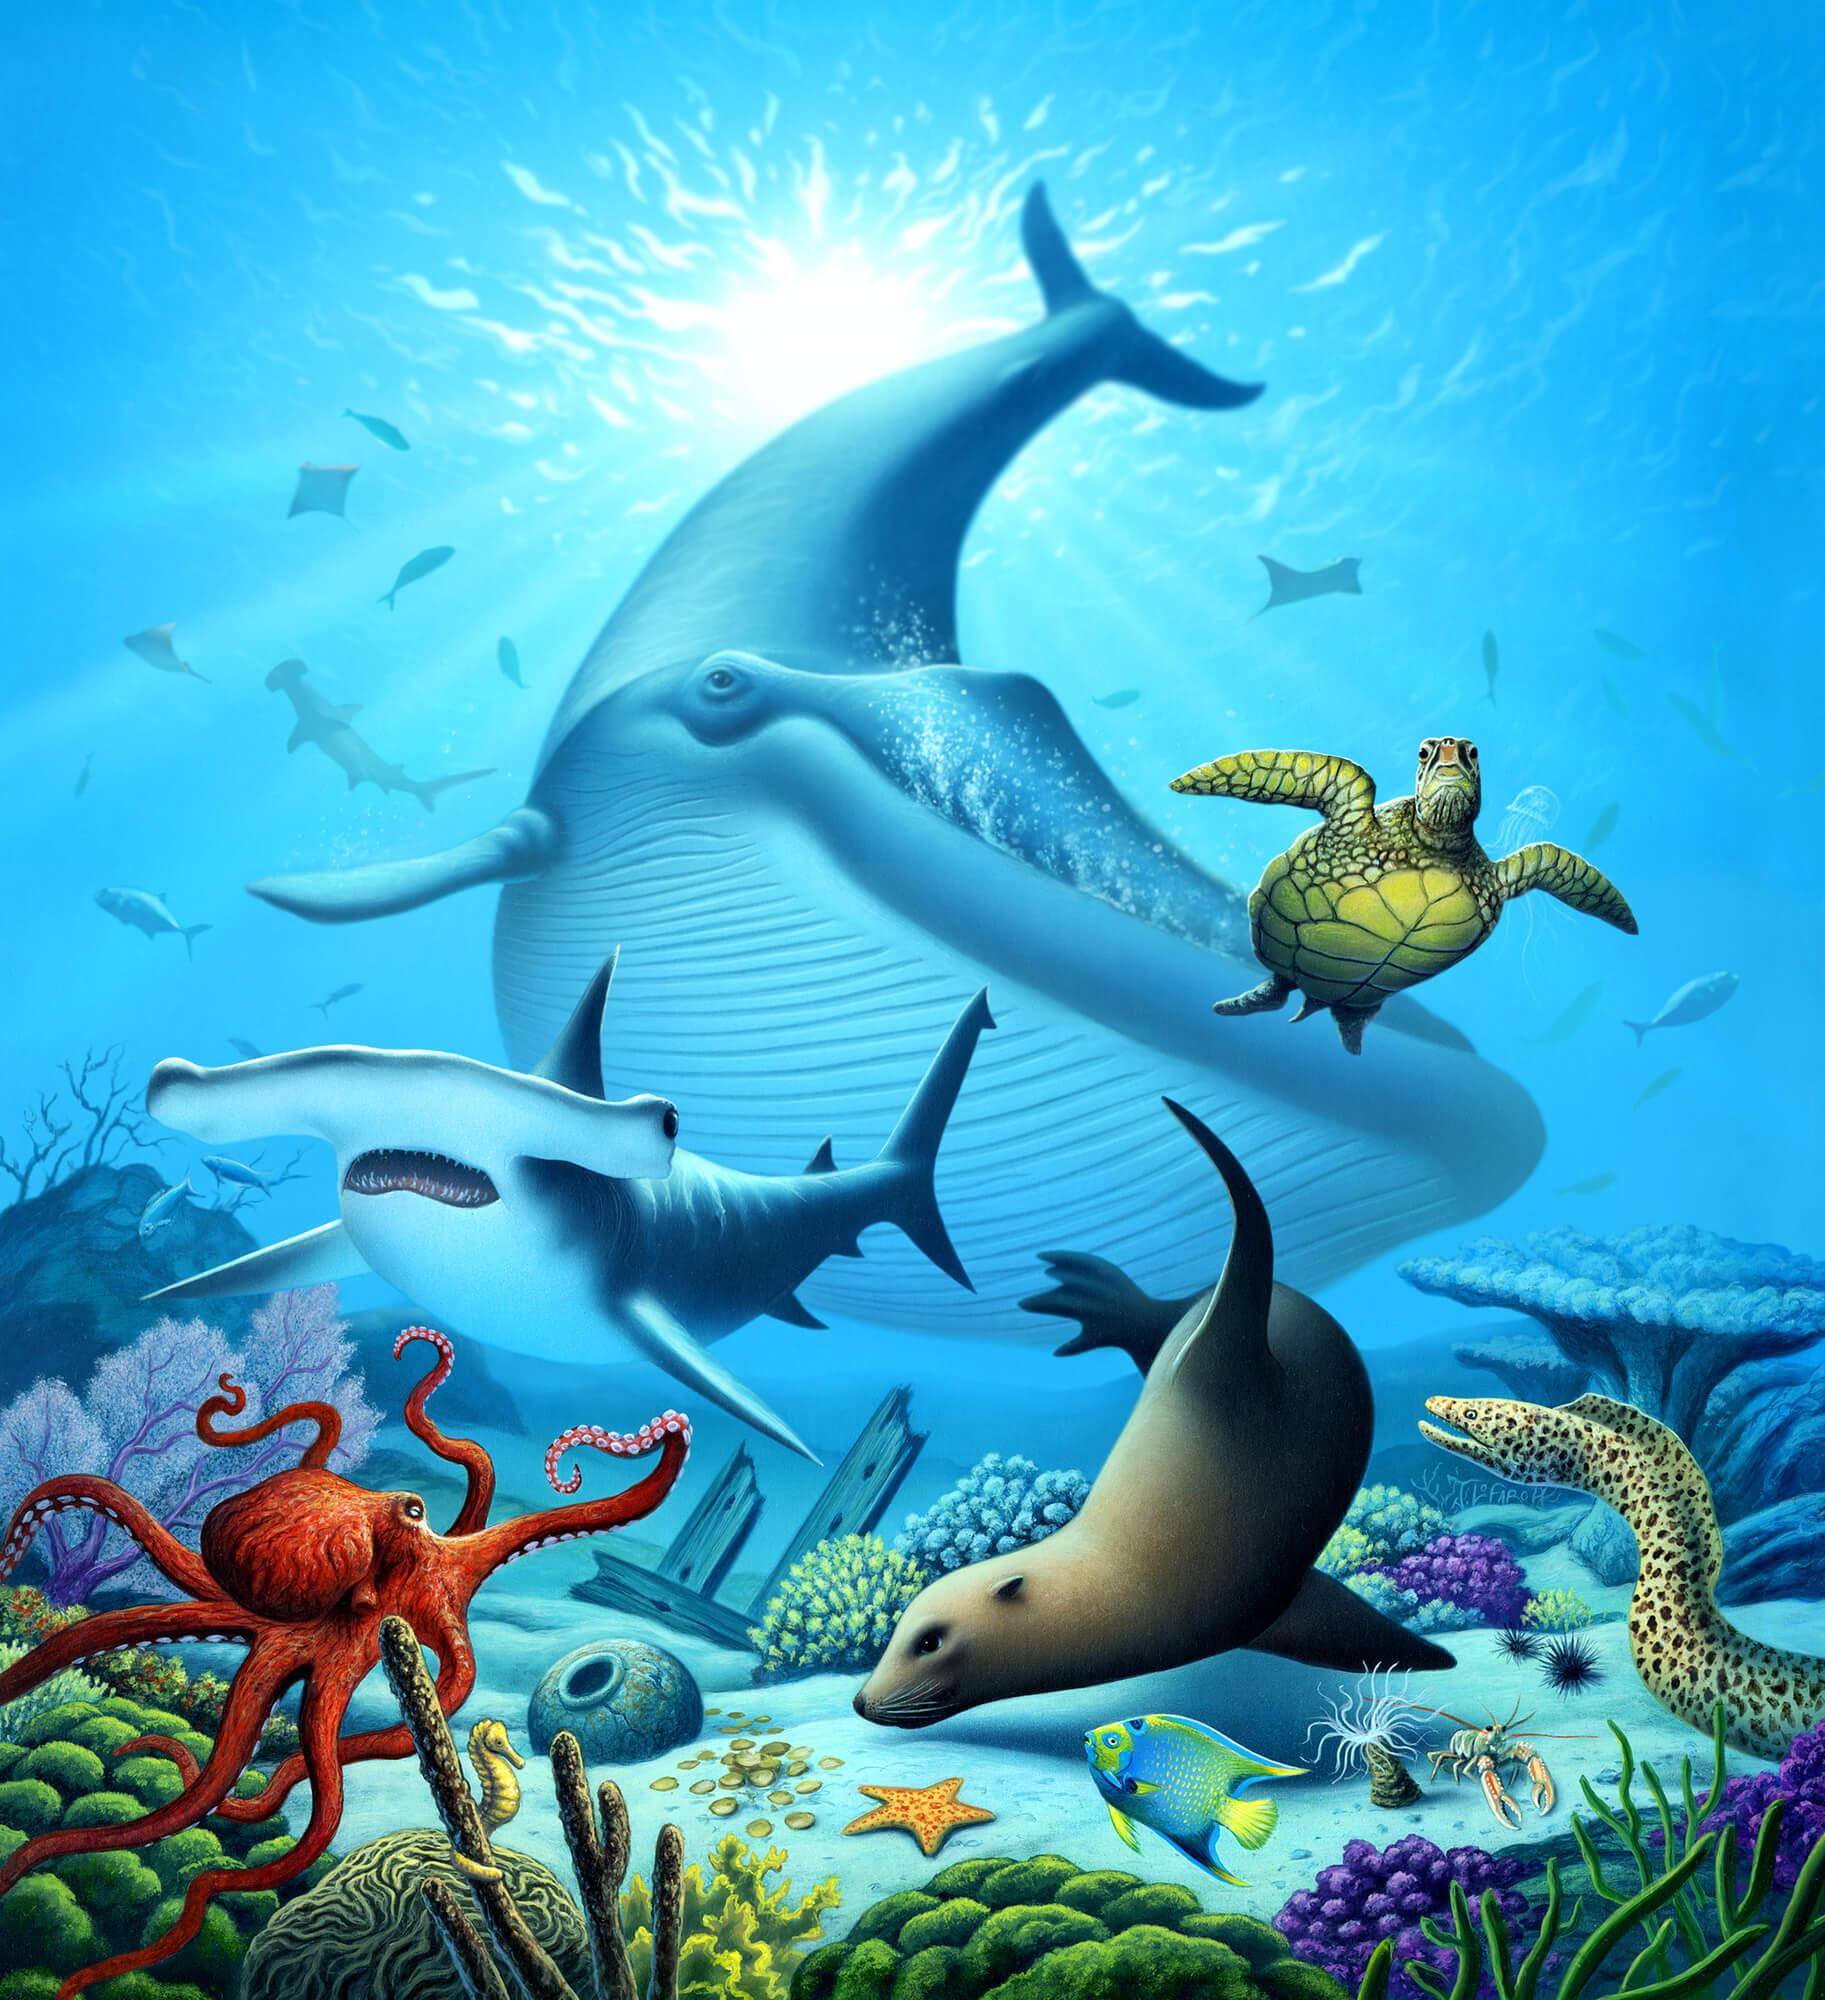 Ocean life wall mural ocean life wallpaper wallsauce europe ocean life wall mural photo wallpaper amipublicfo Gallery